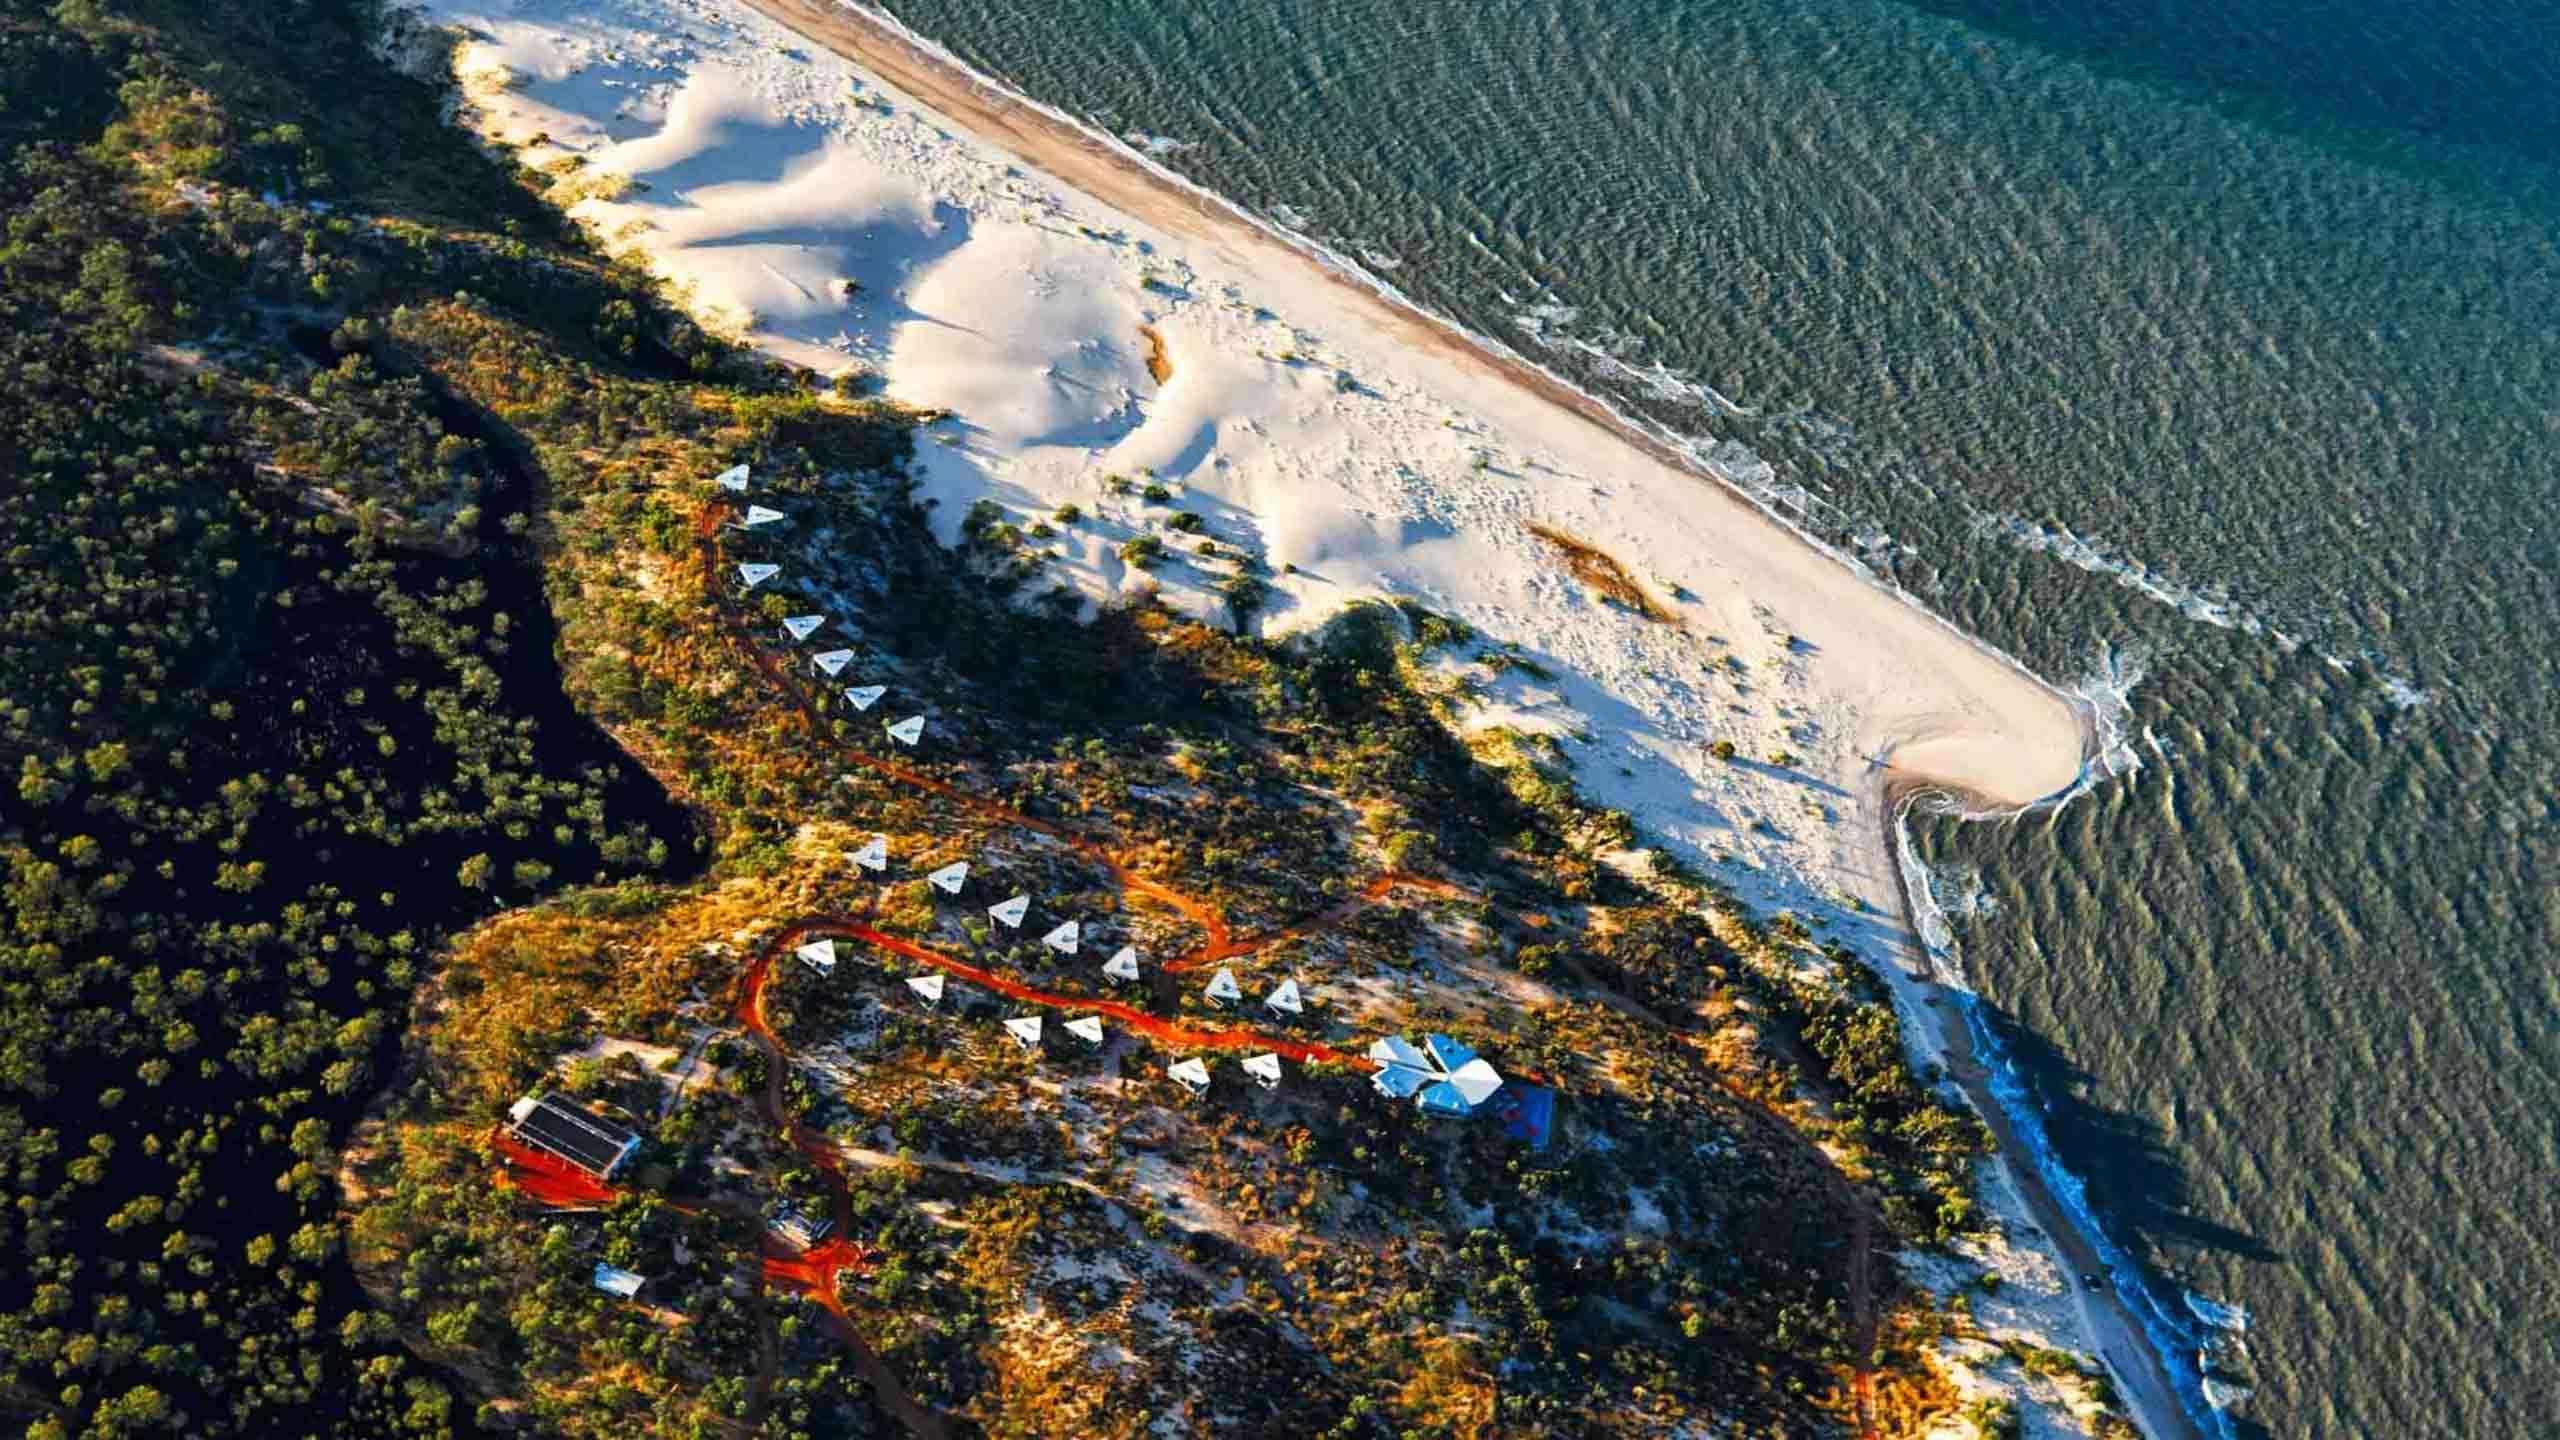 The Ultimate Luxury Far North Kimberley Coast Cruise & Walk 5D4N + Berkeley River Lodge